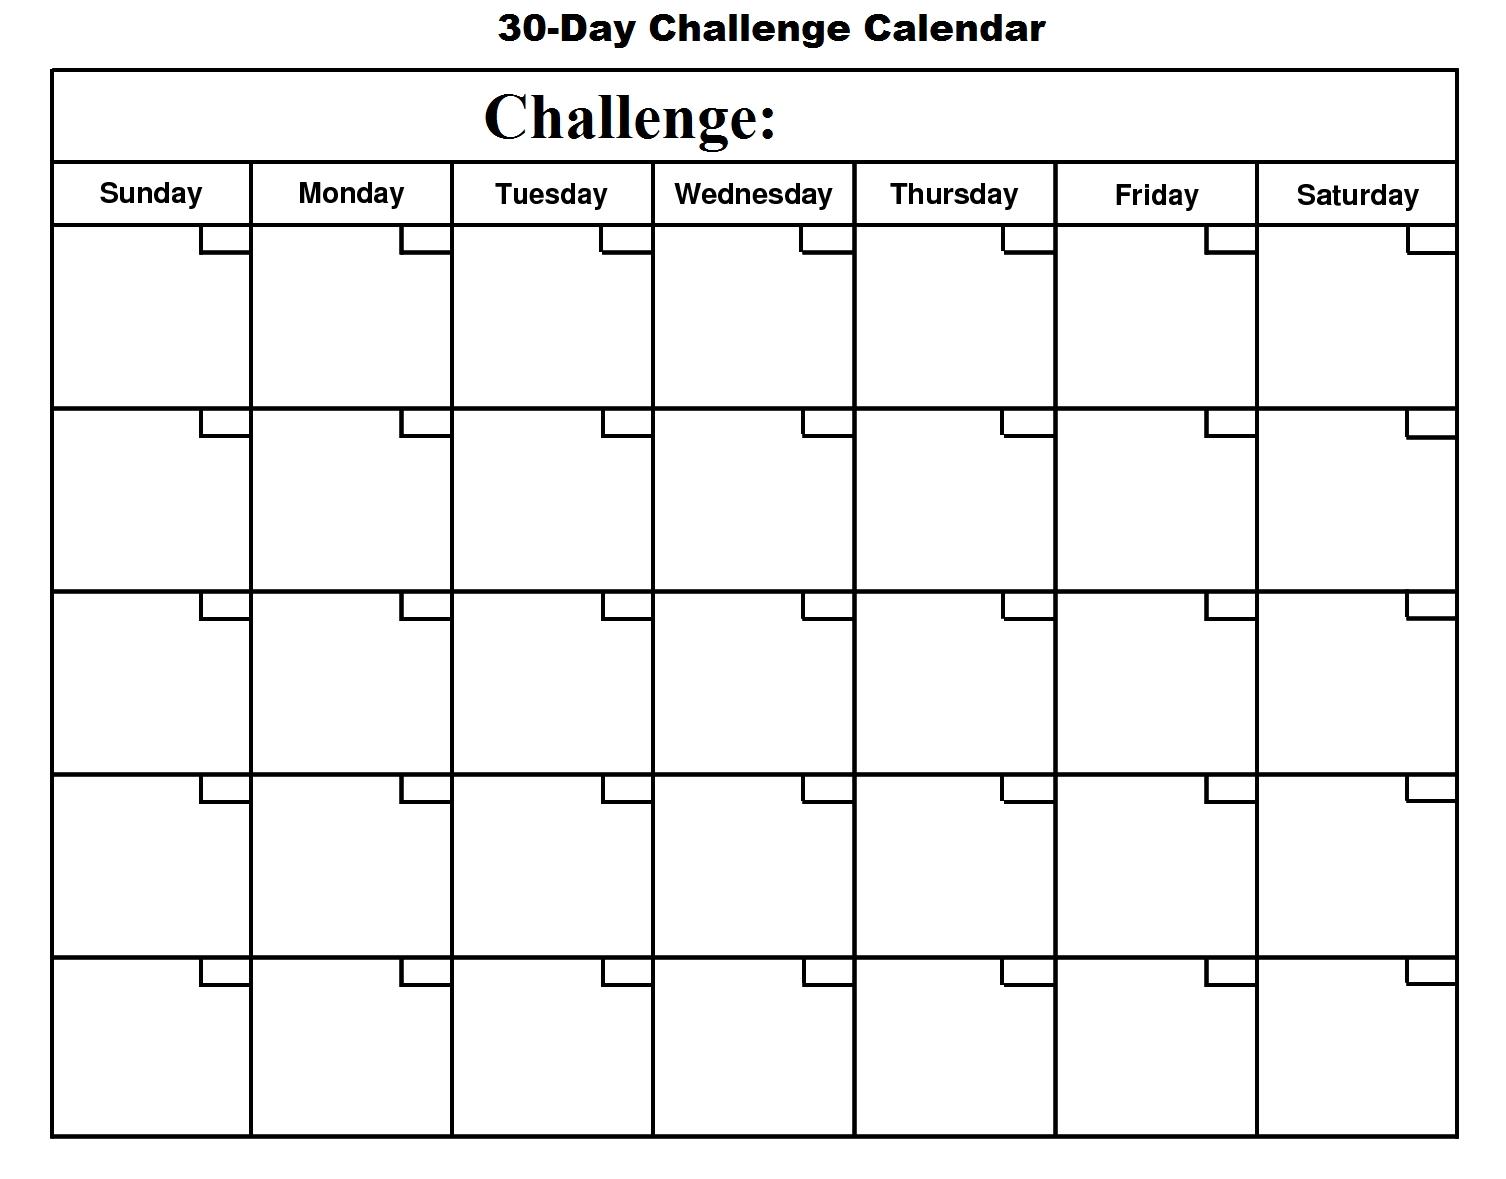 30 Day Calendar - Google Search | Free Printable Calendar for 30 Day Calendars Free Printable